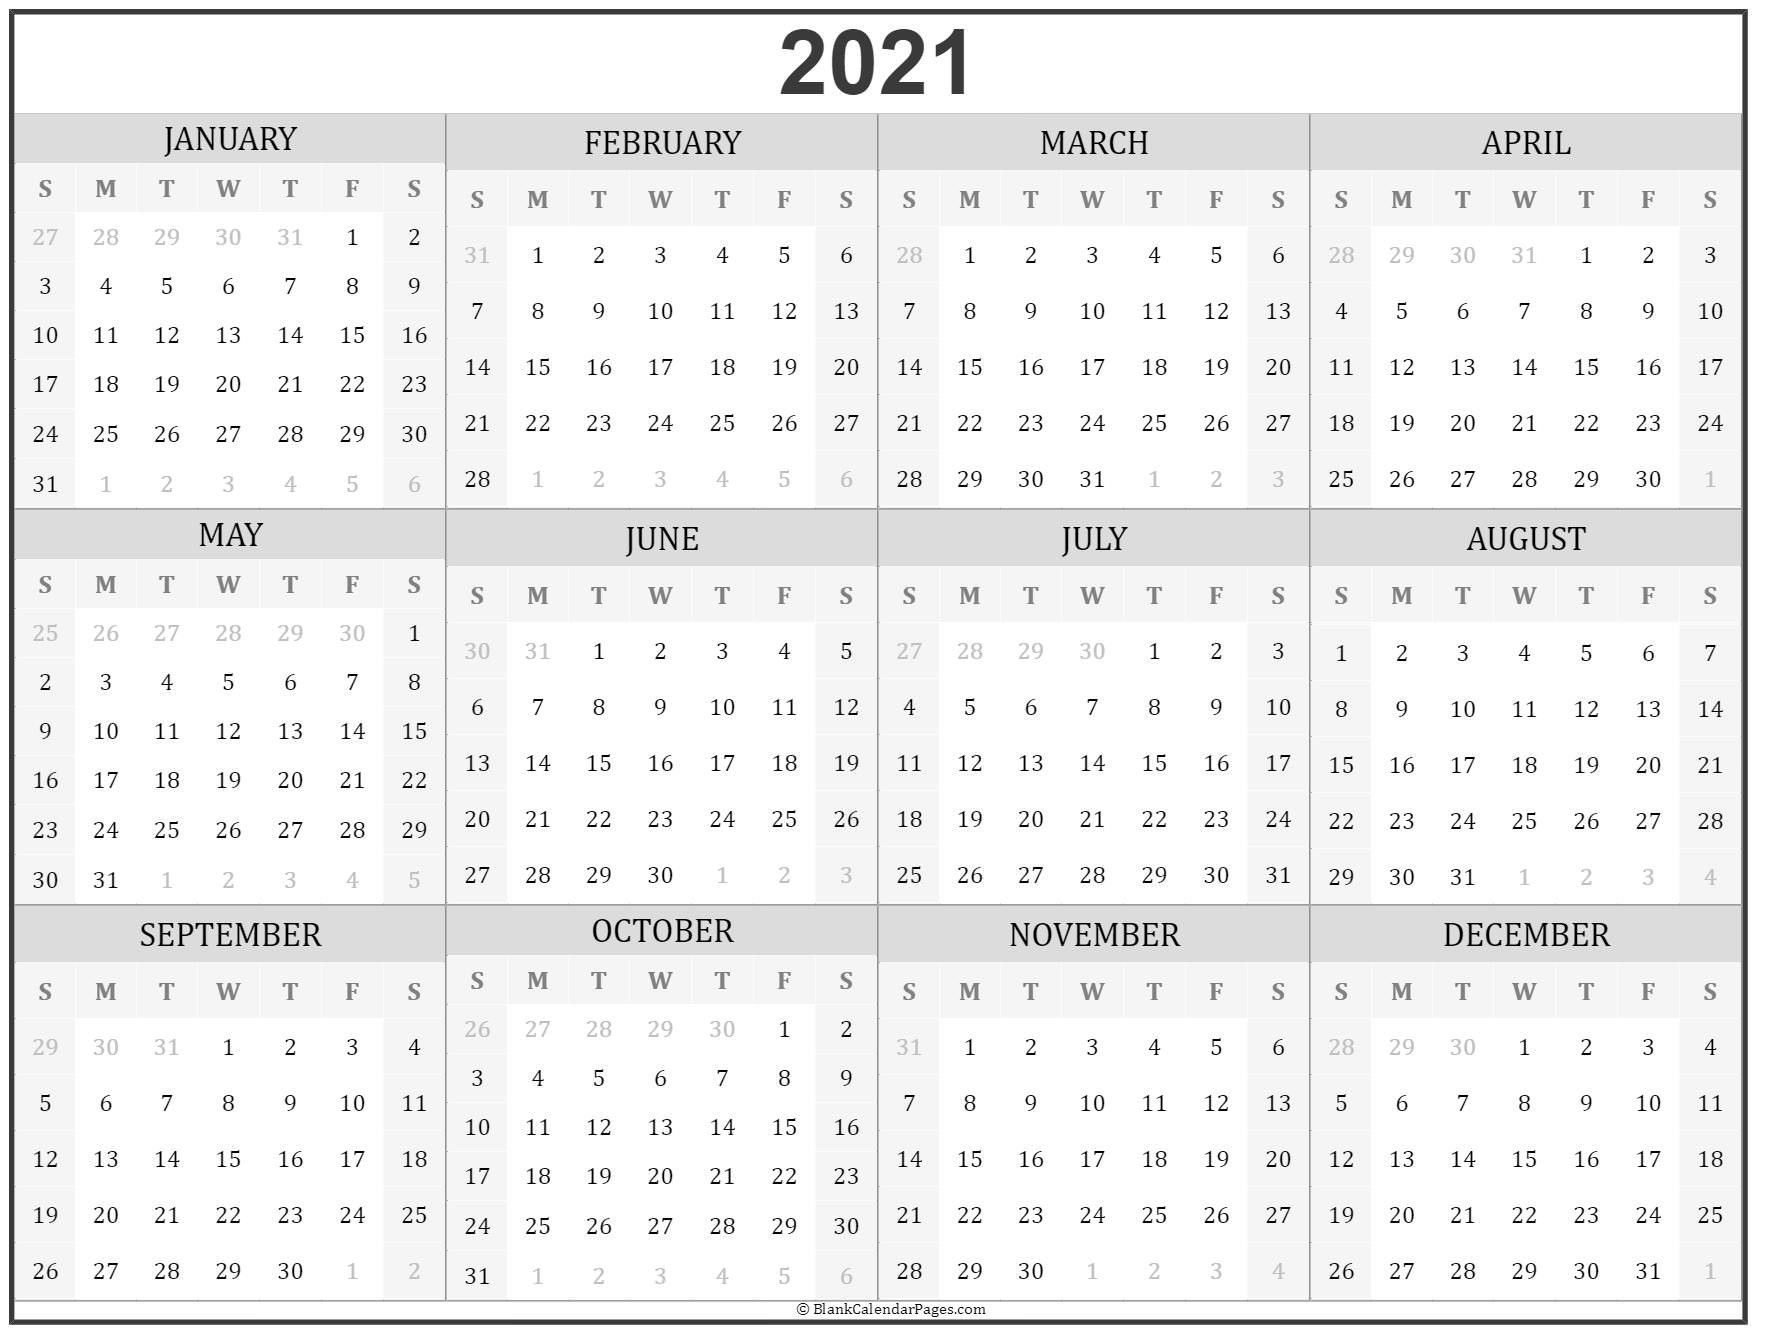 2021 Year Calendar 2021 Year Calendar 2021 Year Calendar